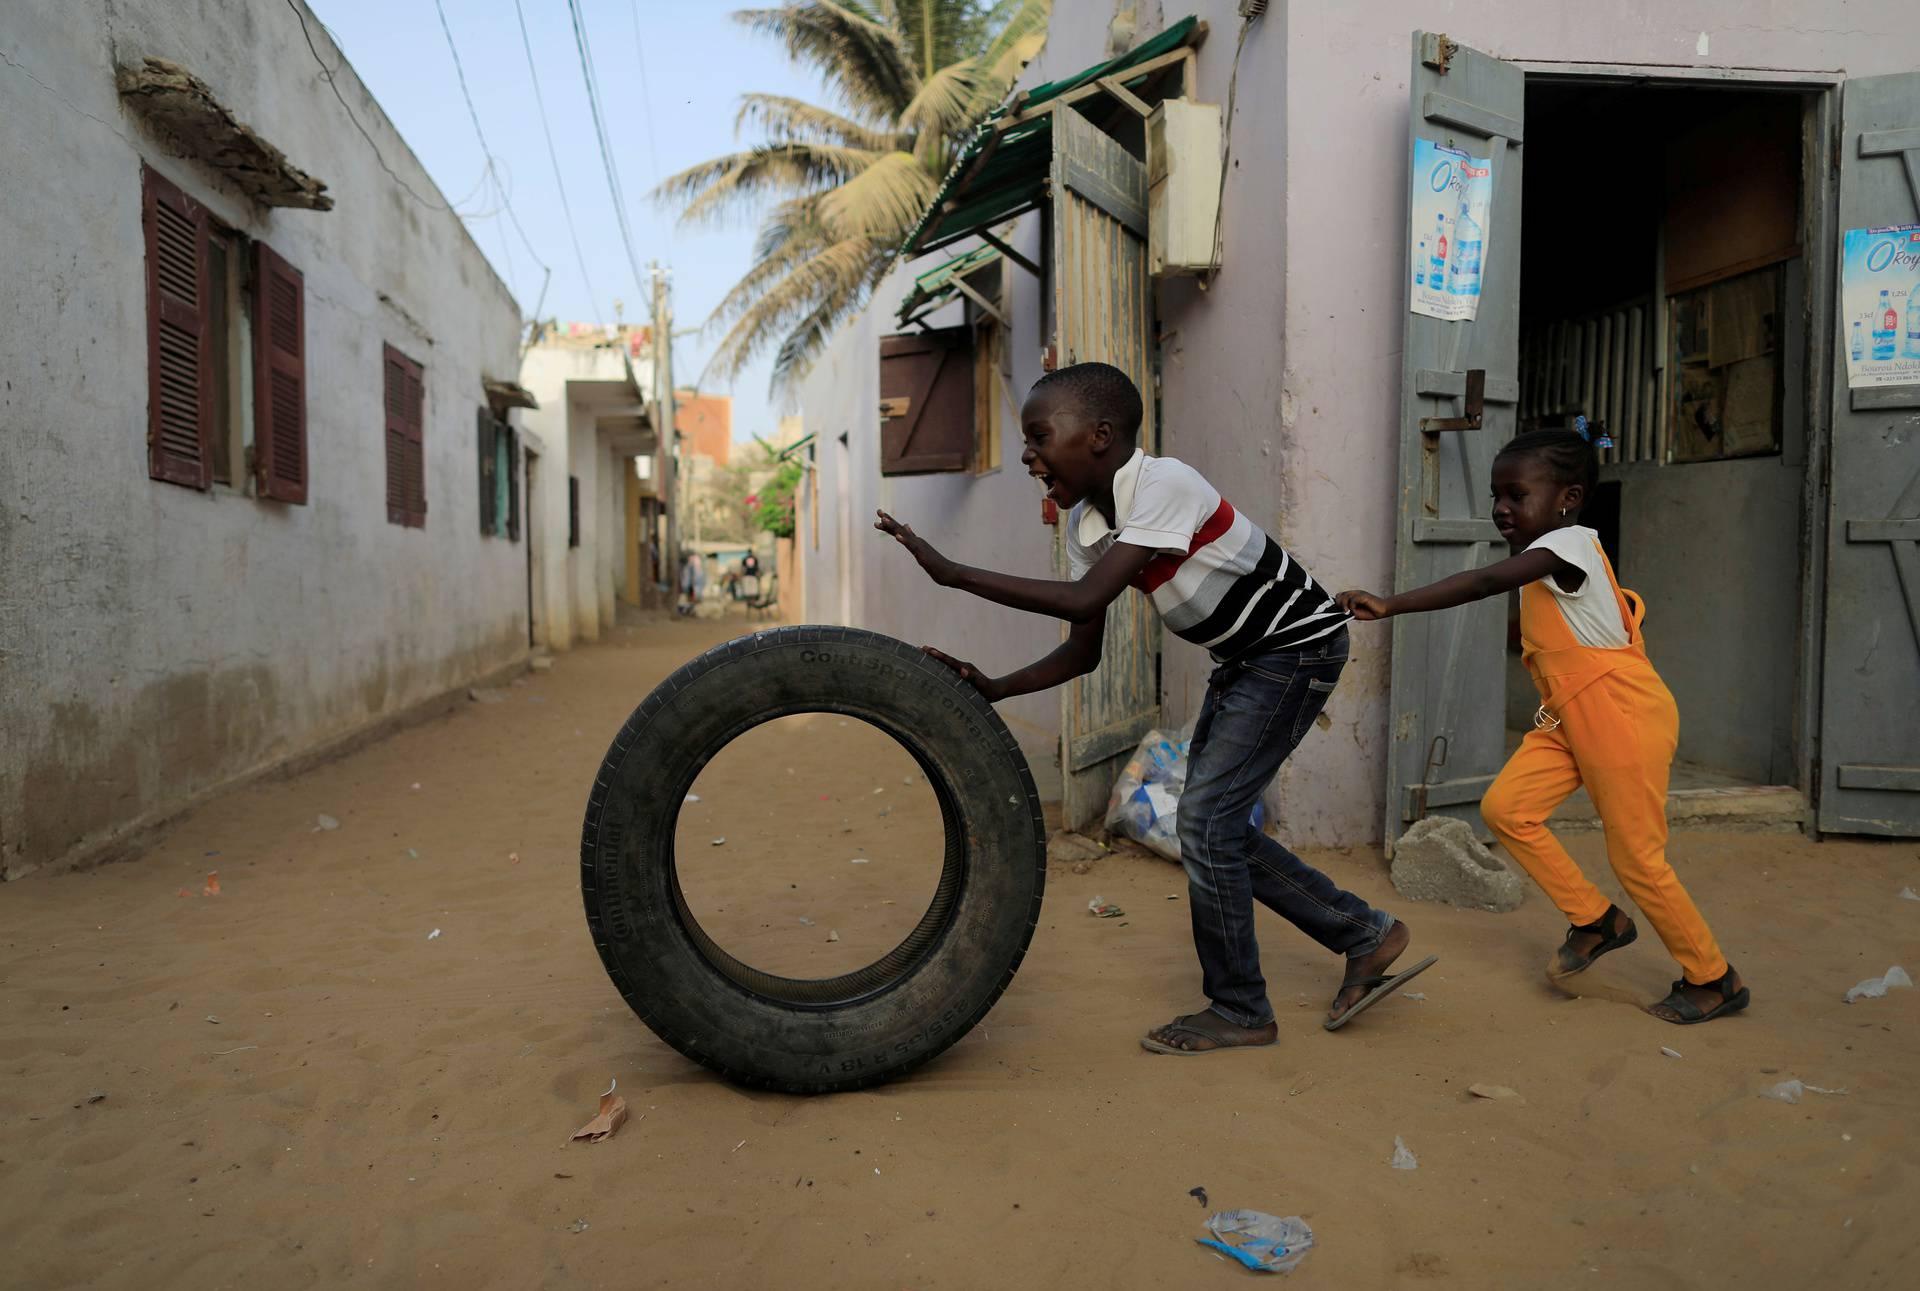 Outbreak of the coronavirus disease (COVID-19) in Yoff neighbourhood of Dakar